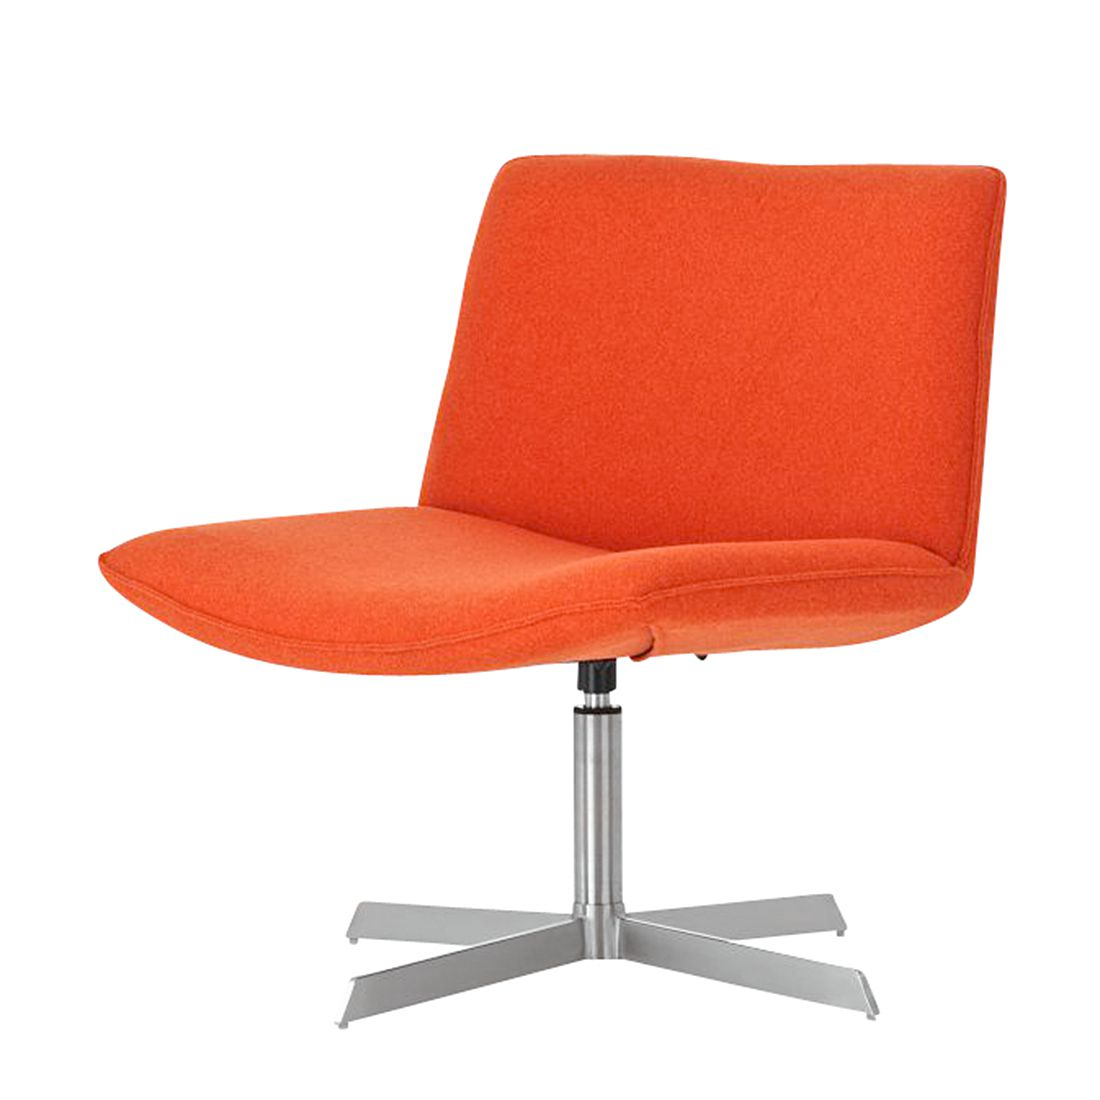 Loungesessel Lugano – Orange -Stoff/Edelstahl, CLP günstig